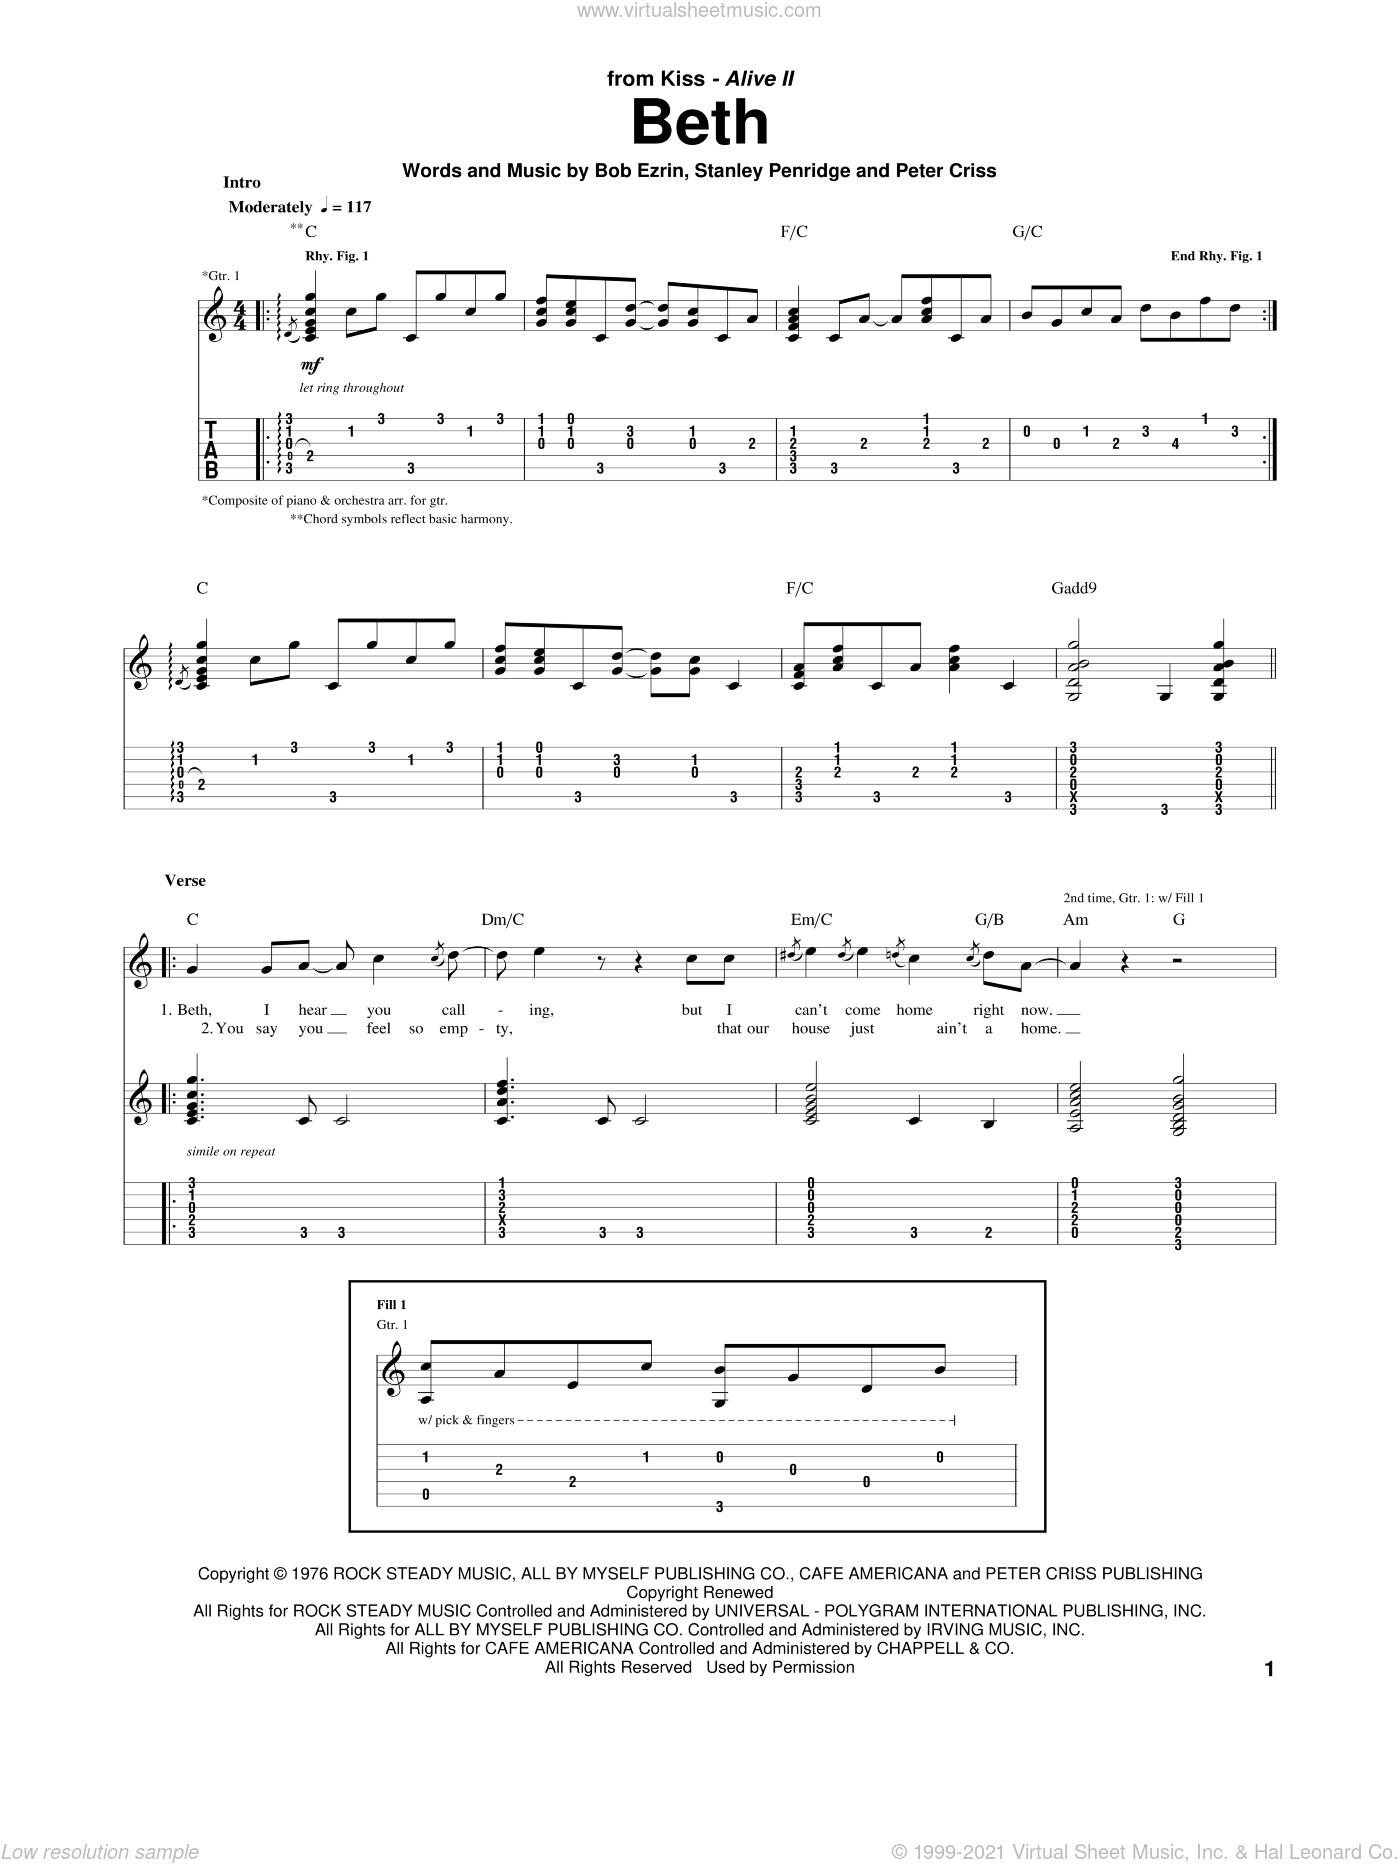 Beth sheet music for guitar (tablature) by KISS, Bob Ezrin, Peter Criss and Stan Penridge, intermediate skill level